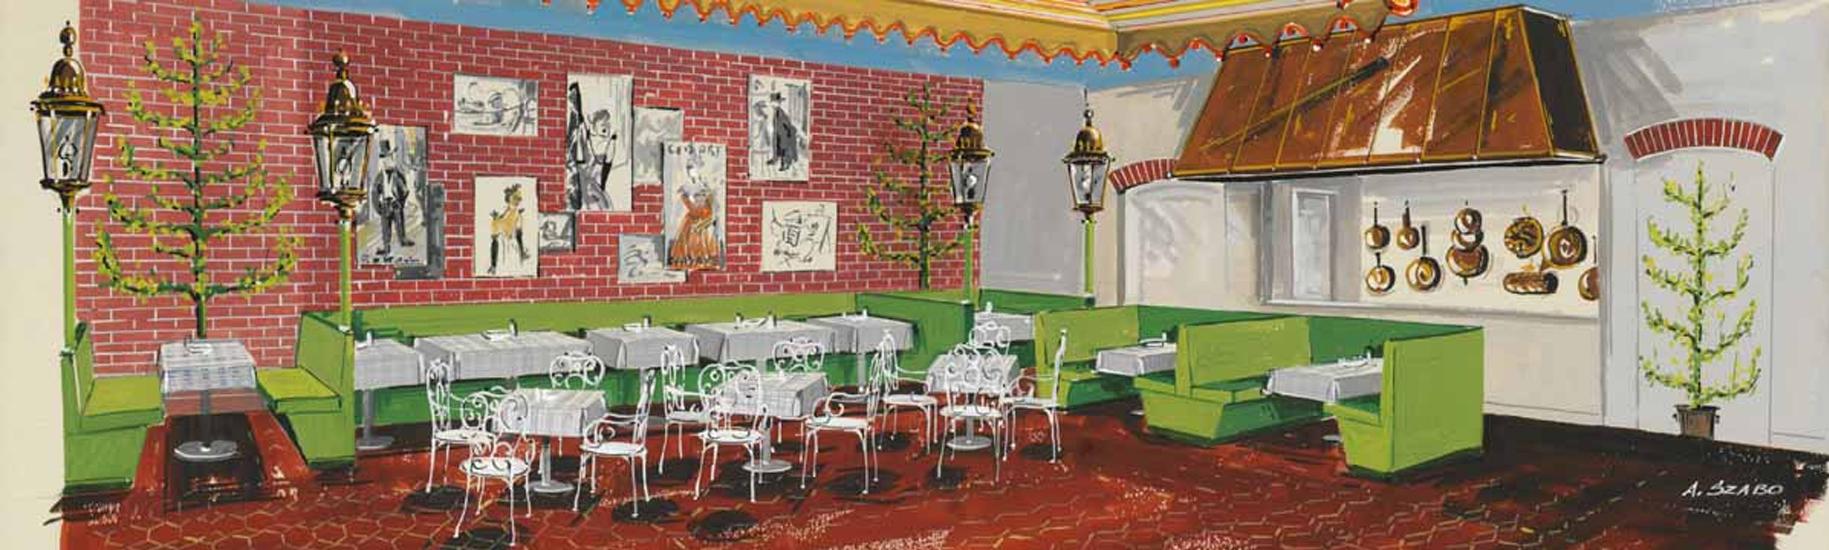 Place_Lautrec_Restaurant_New_York_Hilton_Hotel_New_York